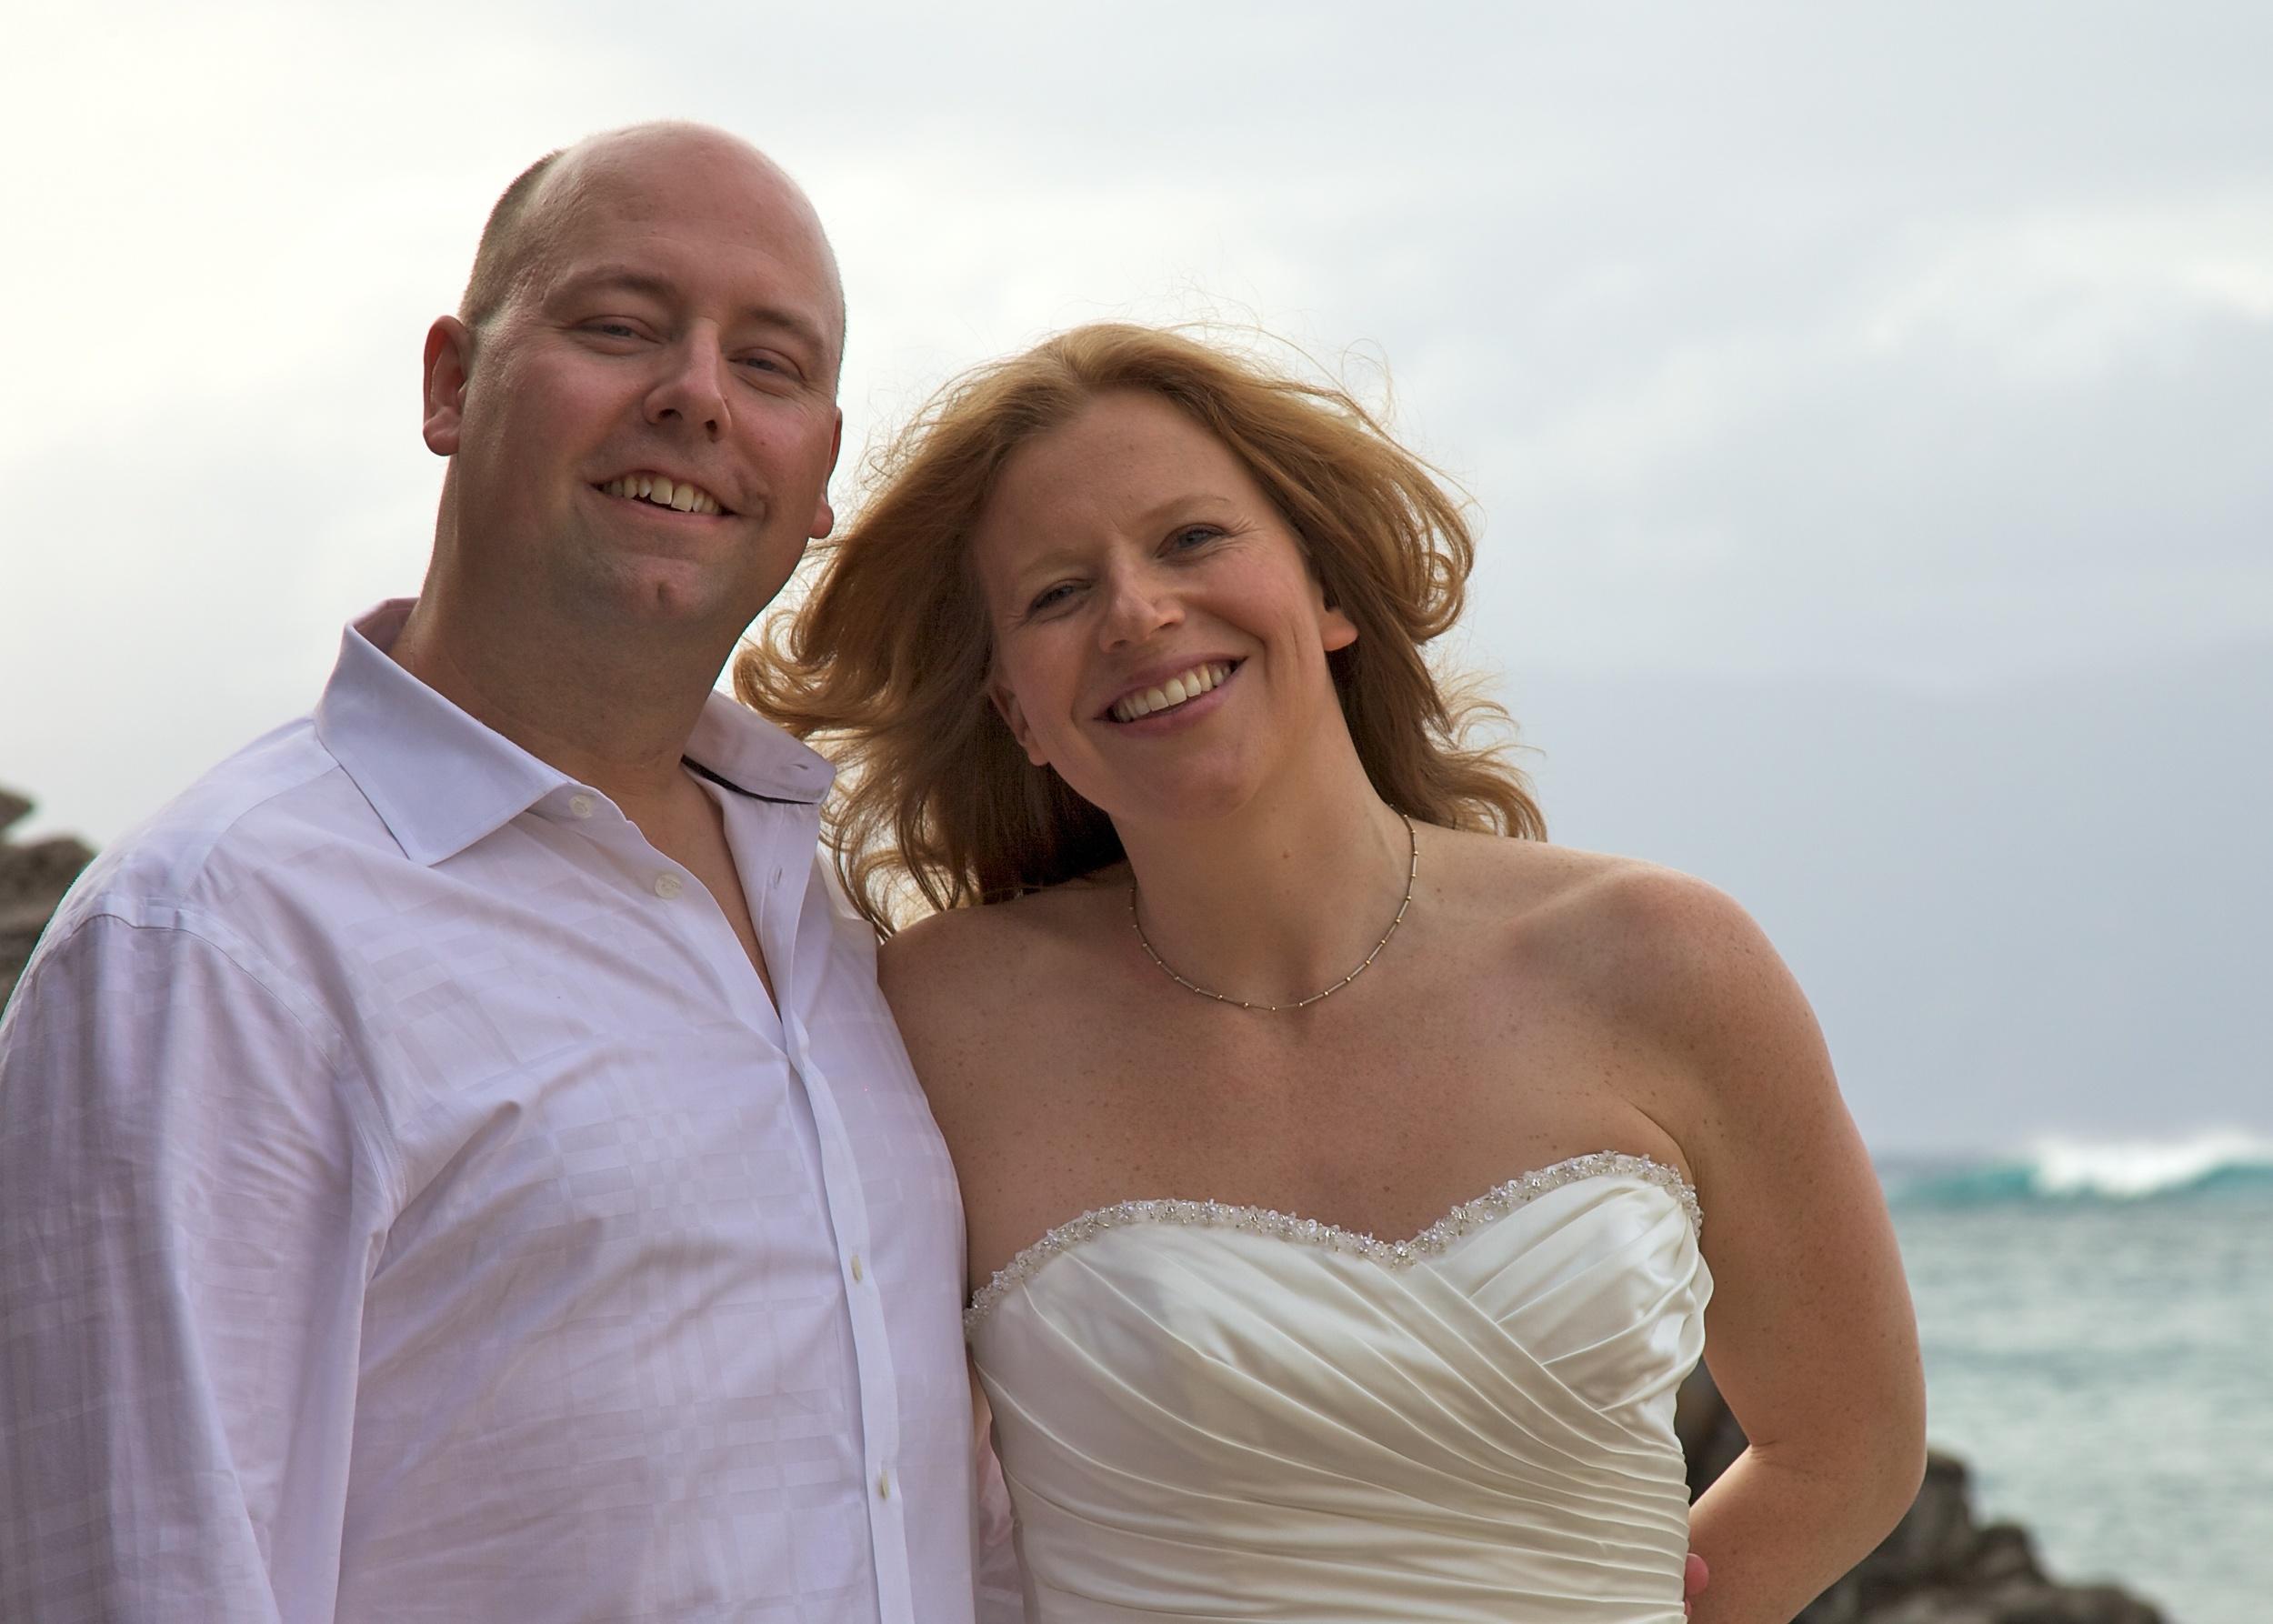 Wedding++28044+%2824+of+50%29-1766416940-O.jpg